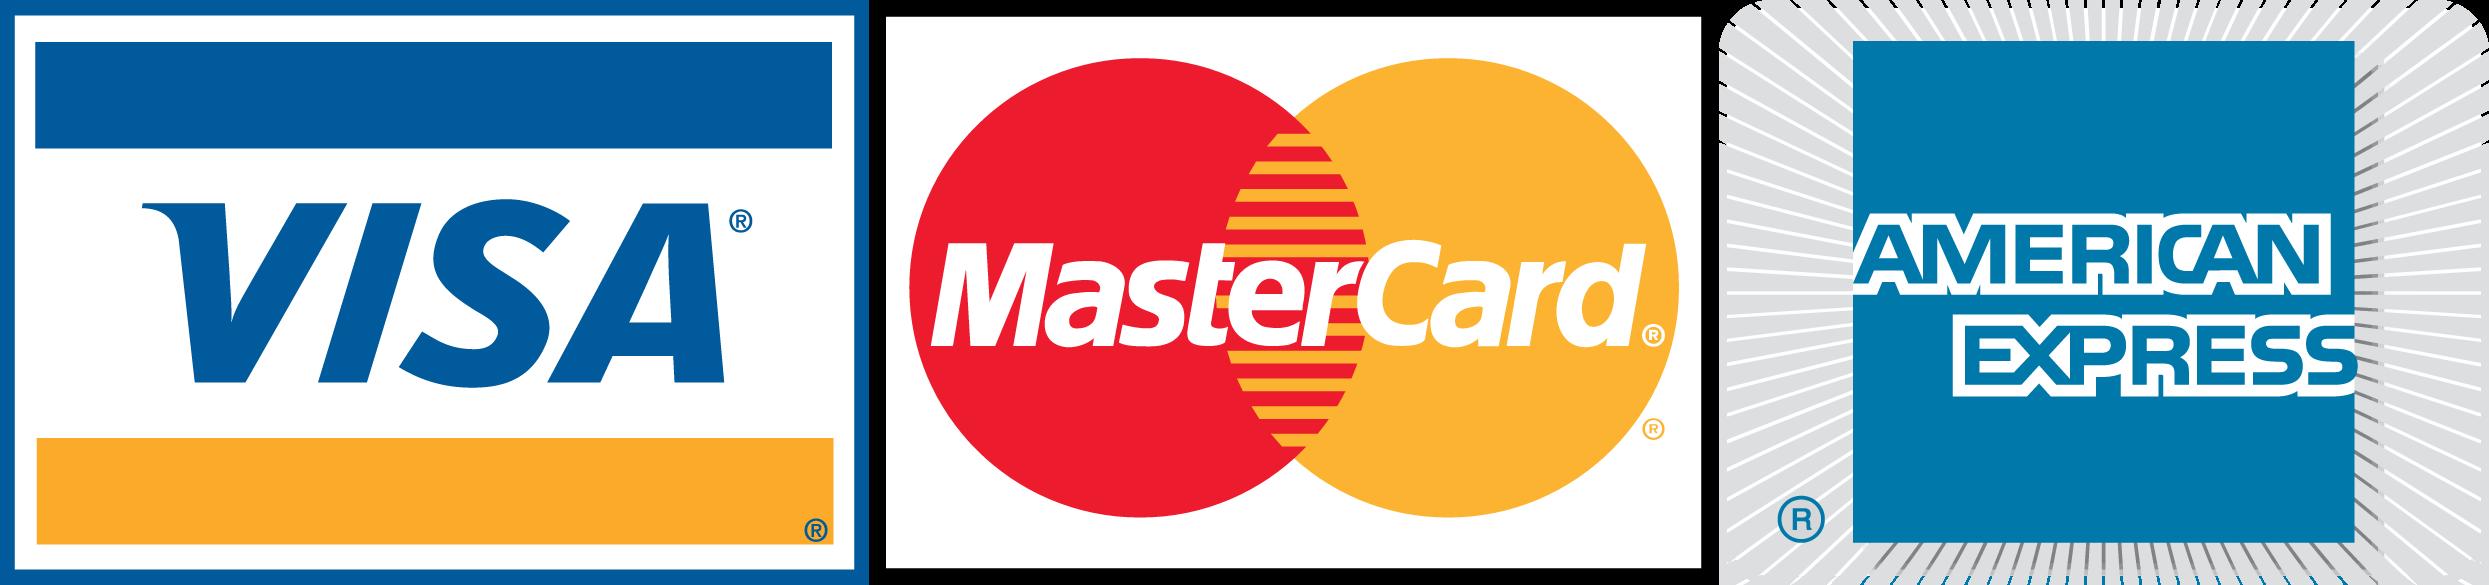 MasterCard, Visa Card, American Express Karte Logos